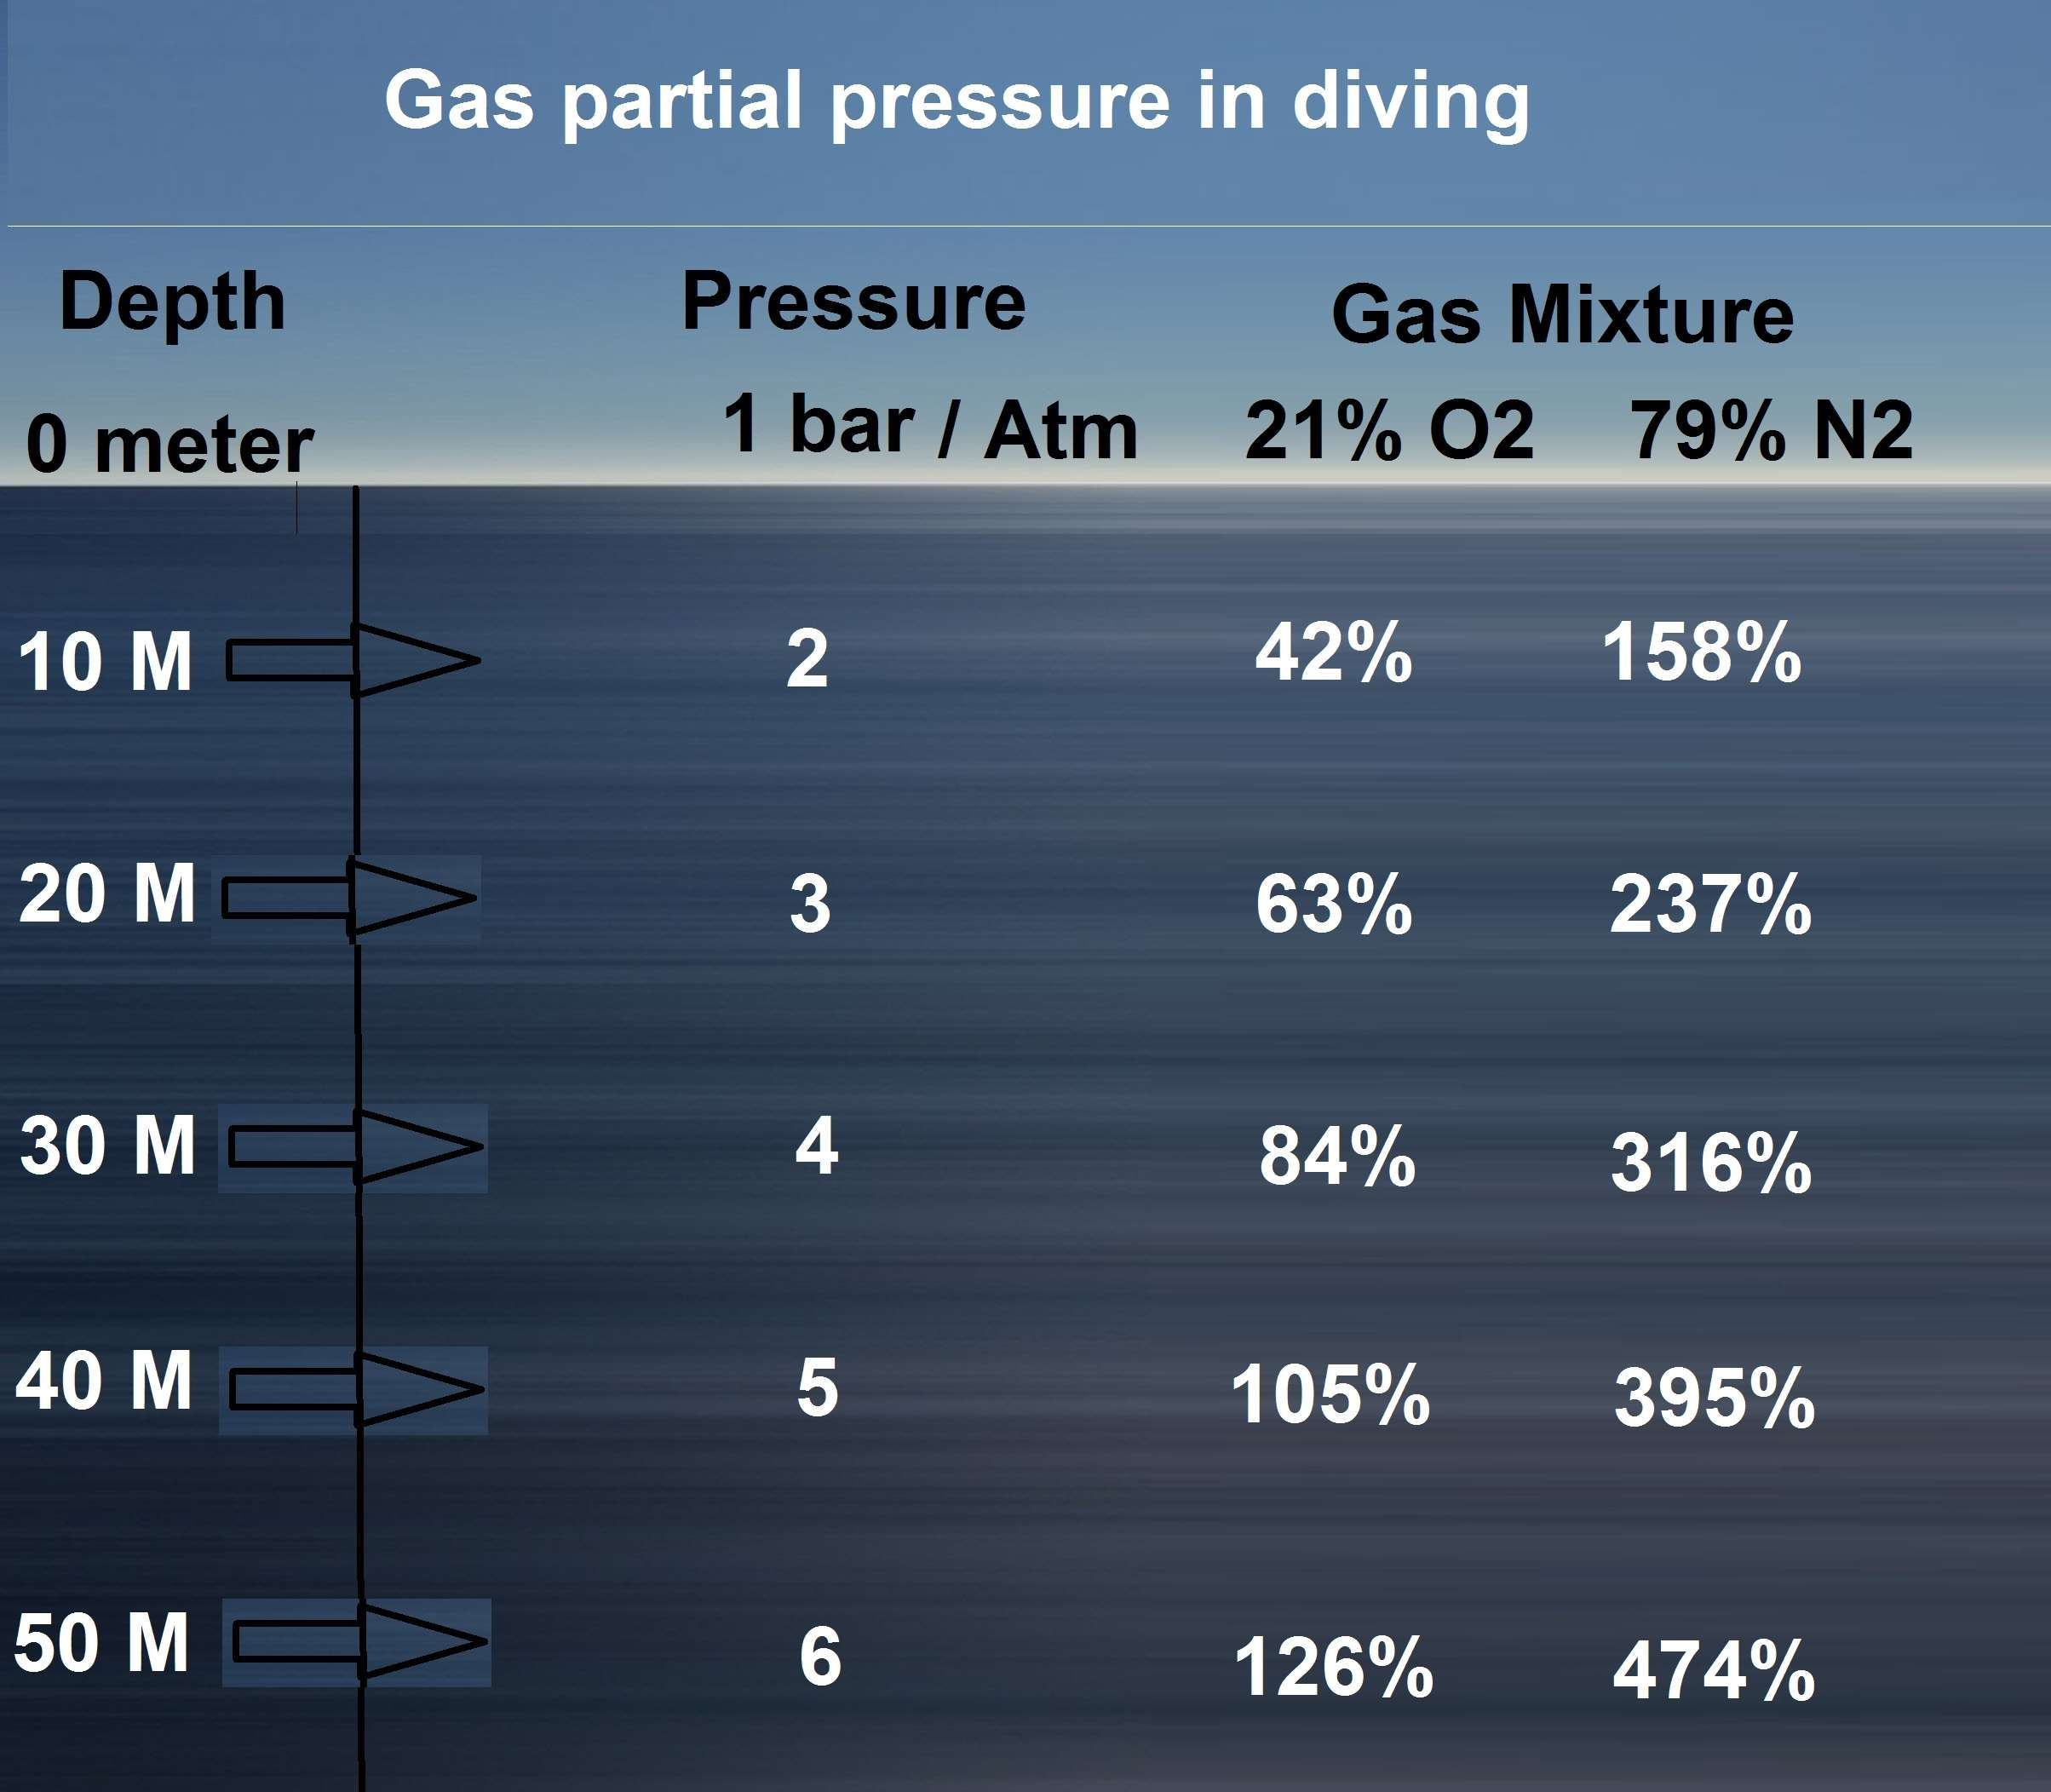 Depth Dive Gas Mixture Nitrogen Oxygen Partial Pressure Scuba Diving Oxygen Nitrogen